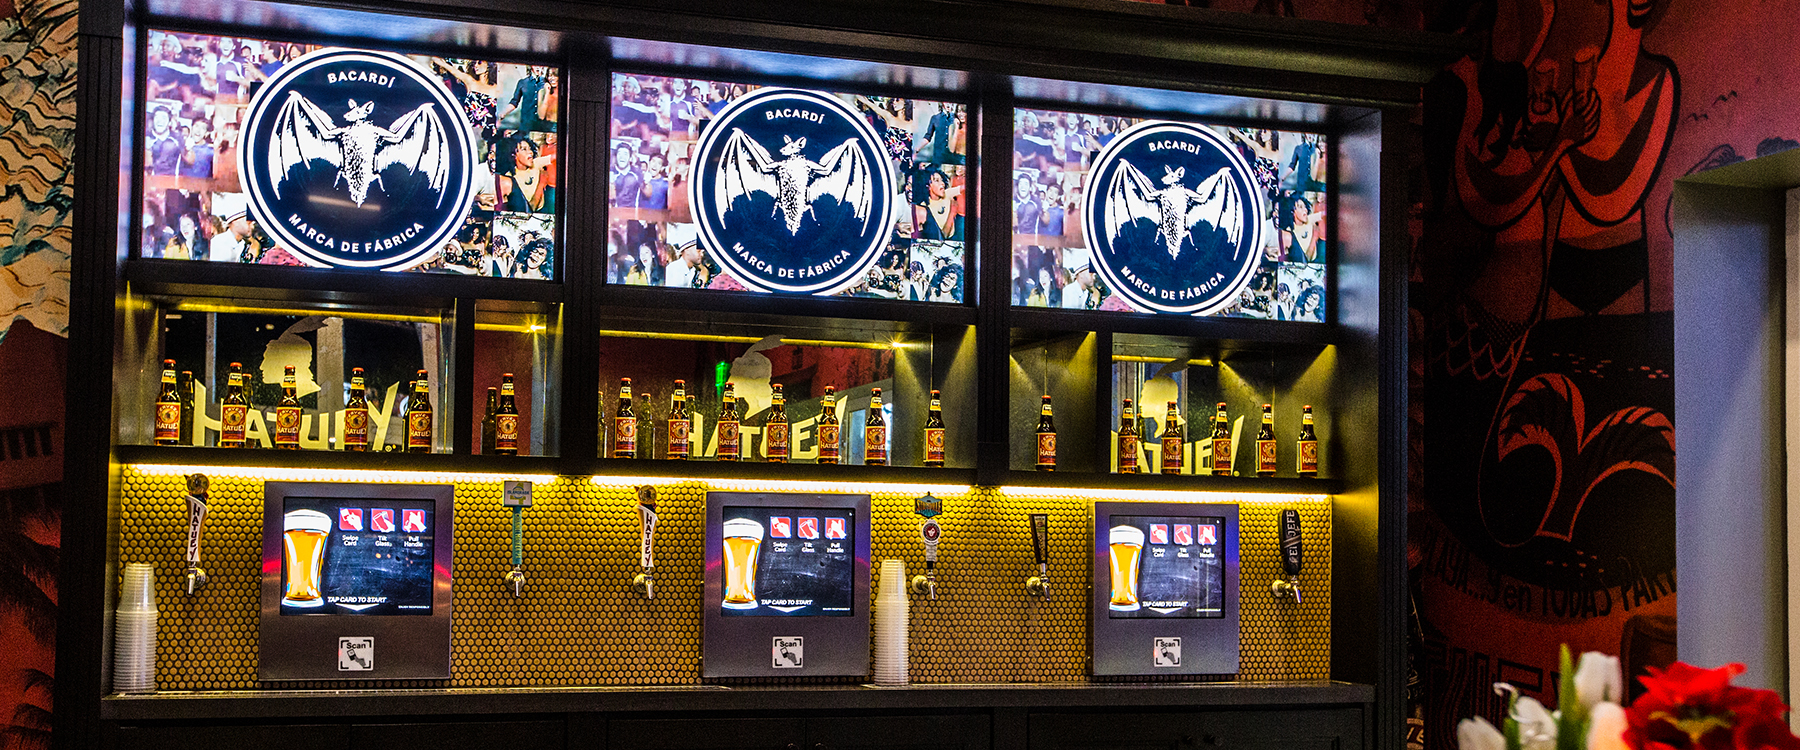 601 Miami – Bacardi / Beer Tap